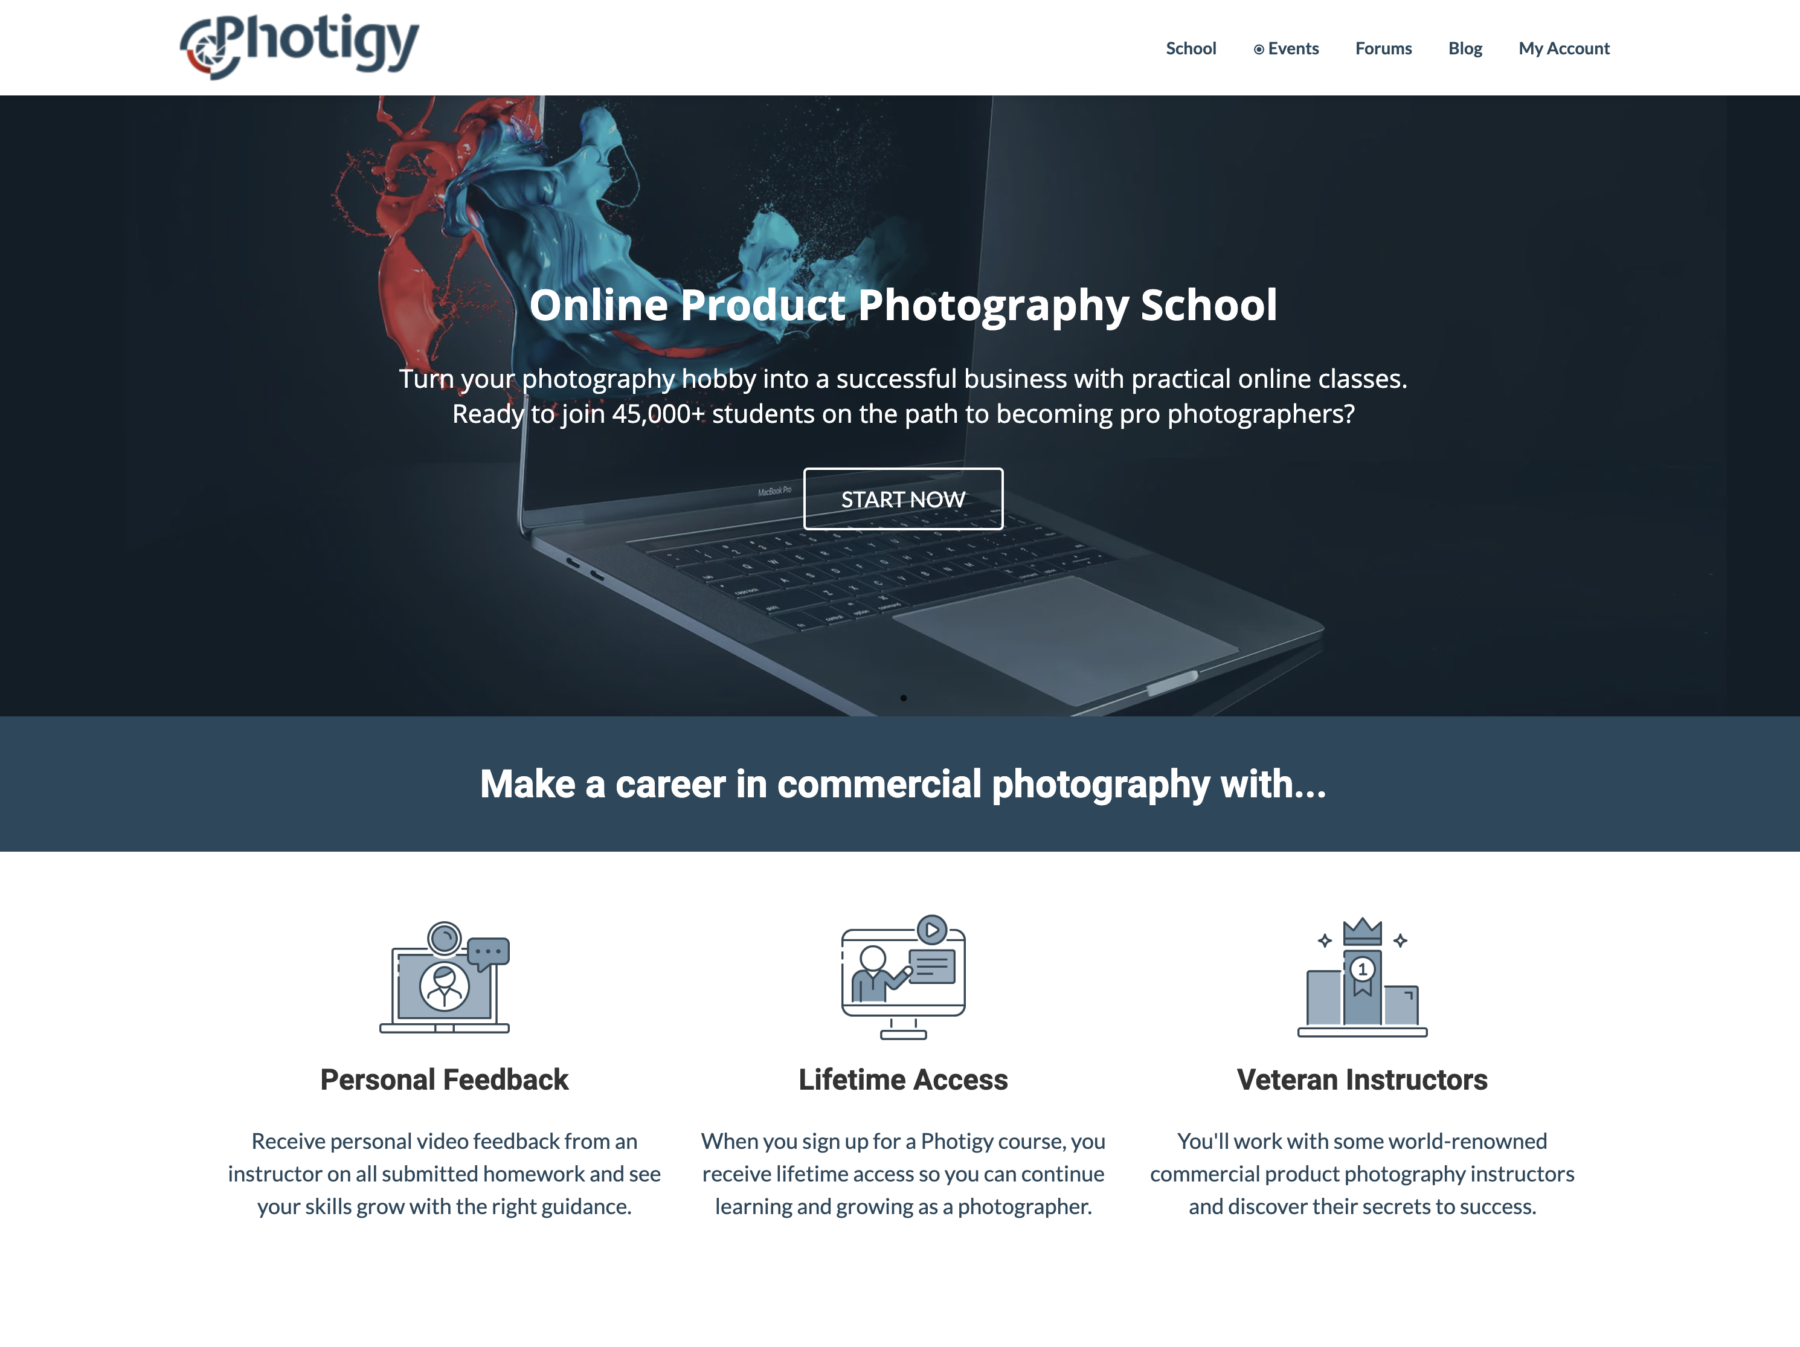 Product Photography online school Photigy